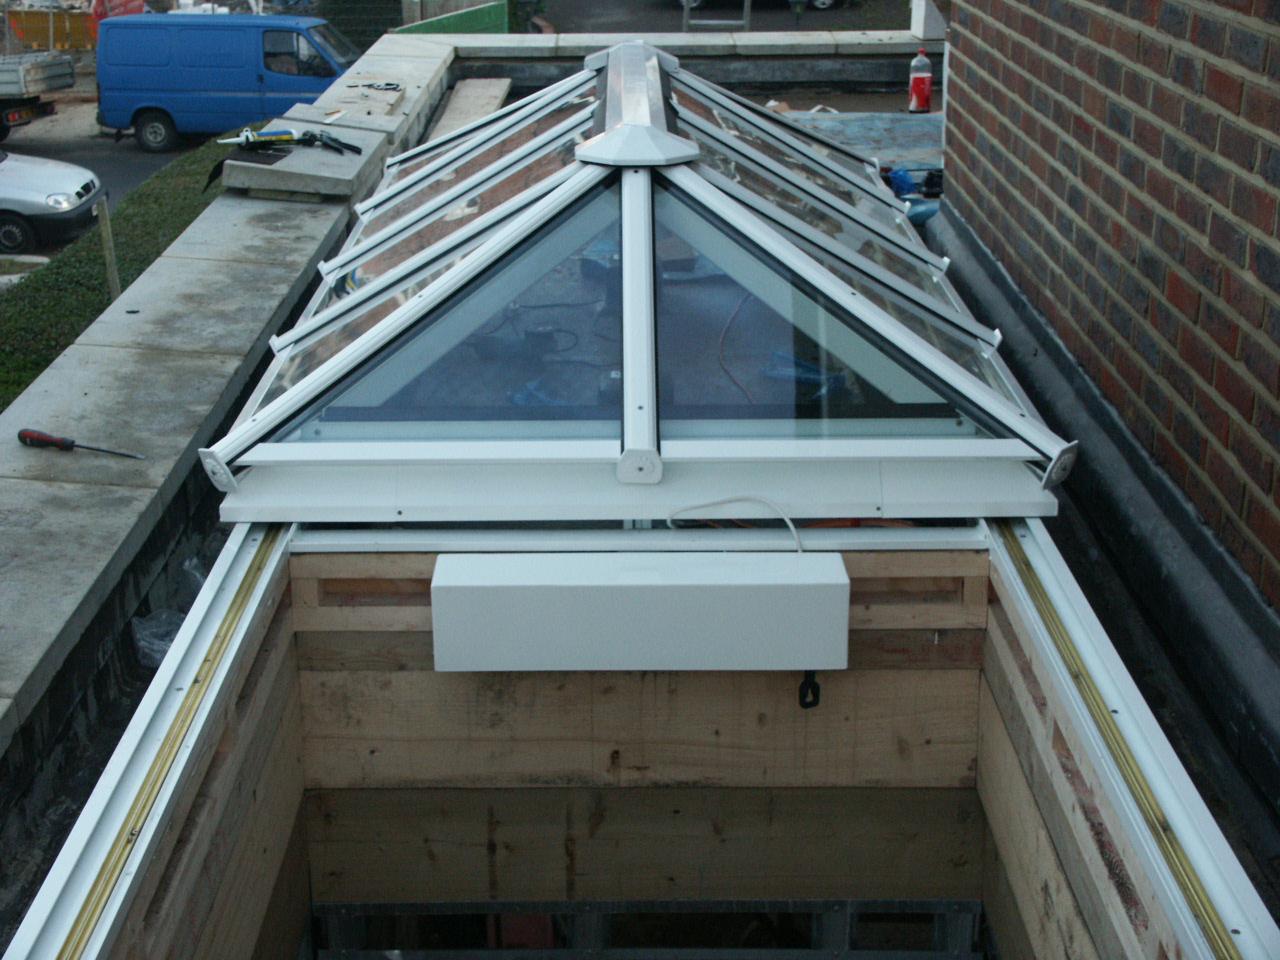 DGB Fully Retracting, Slide Open, Hipped, Glazed Roof, Rooflight, Skylight, Roof Lantern